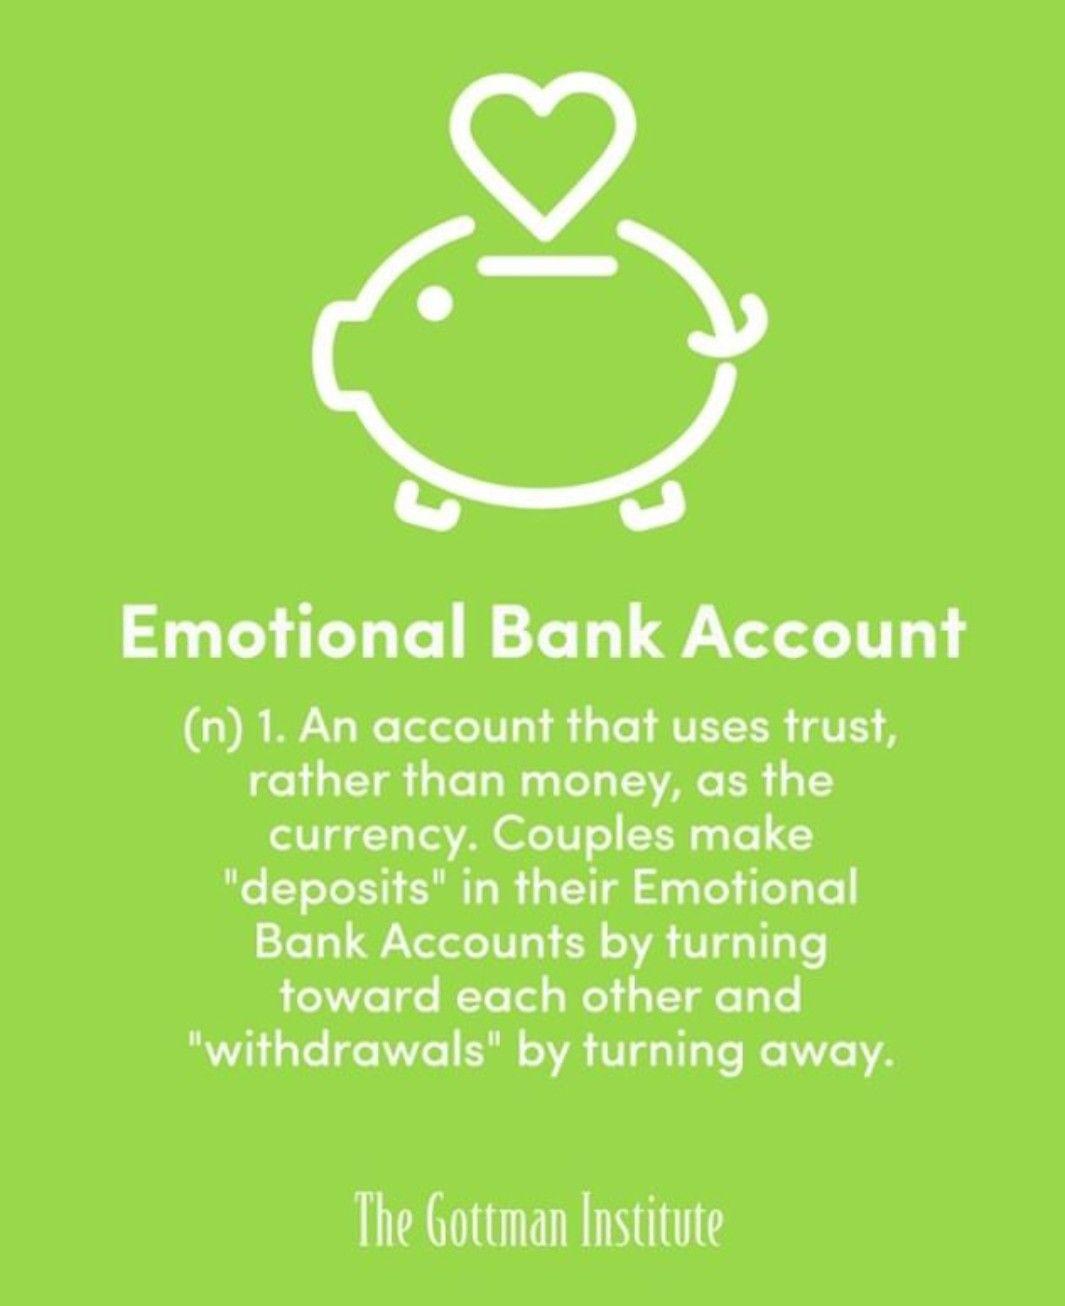 Emotional bank account gottman emotions emotional